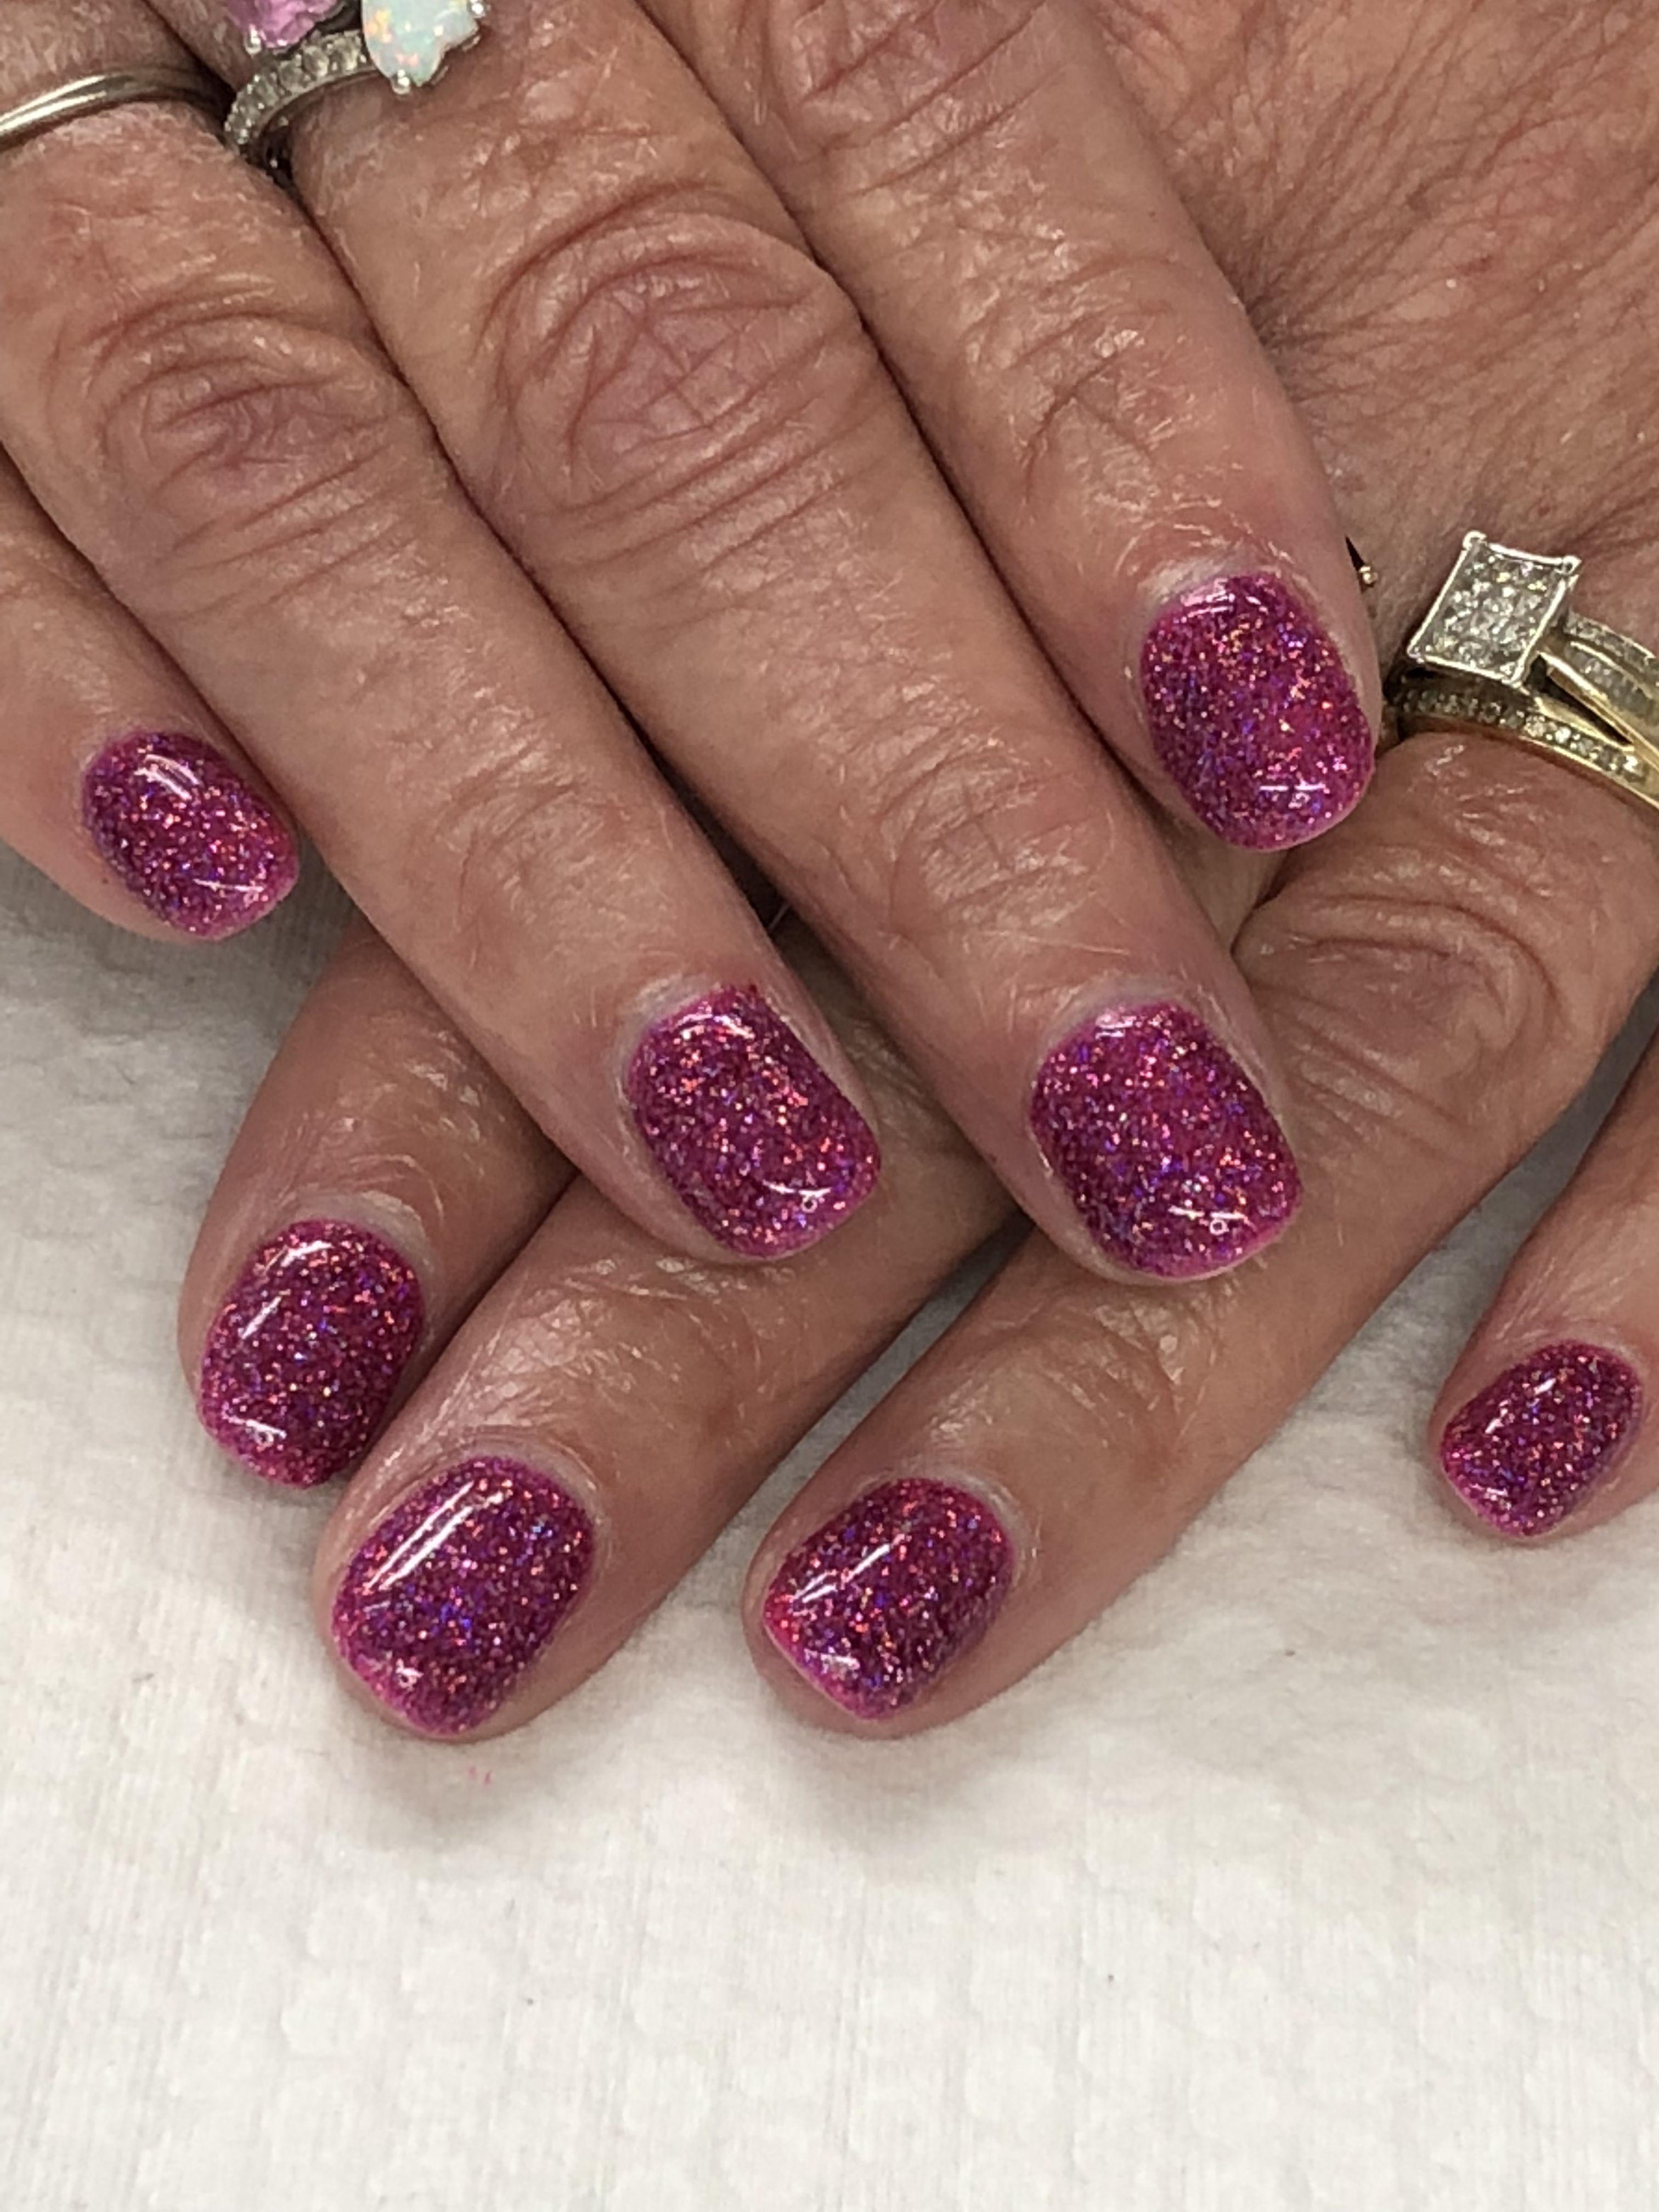 Raspberry Glitter Gel Nails Light Elegance Pinky Swear, Judy Garland ...